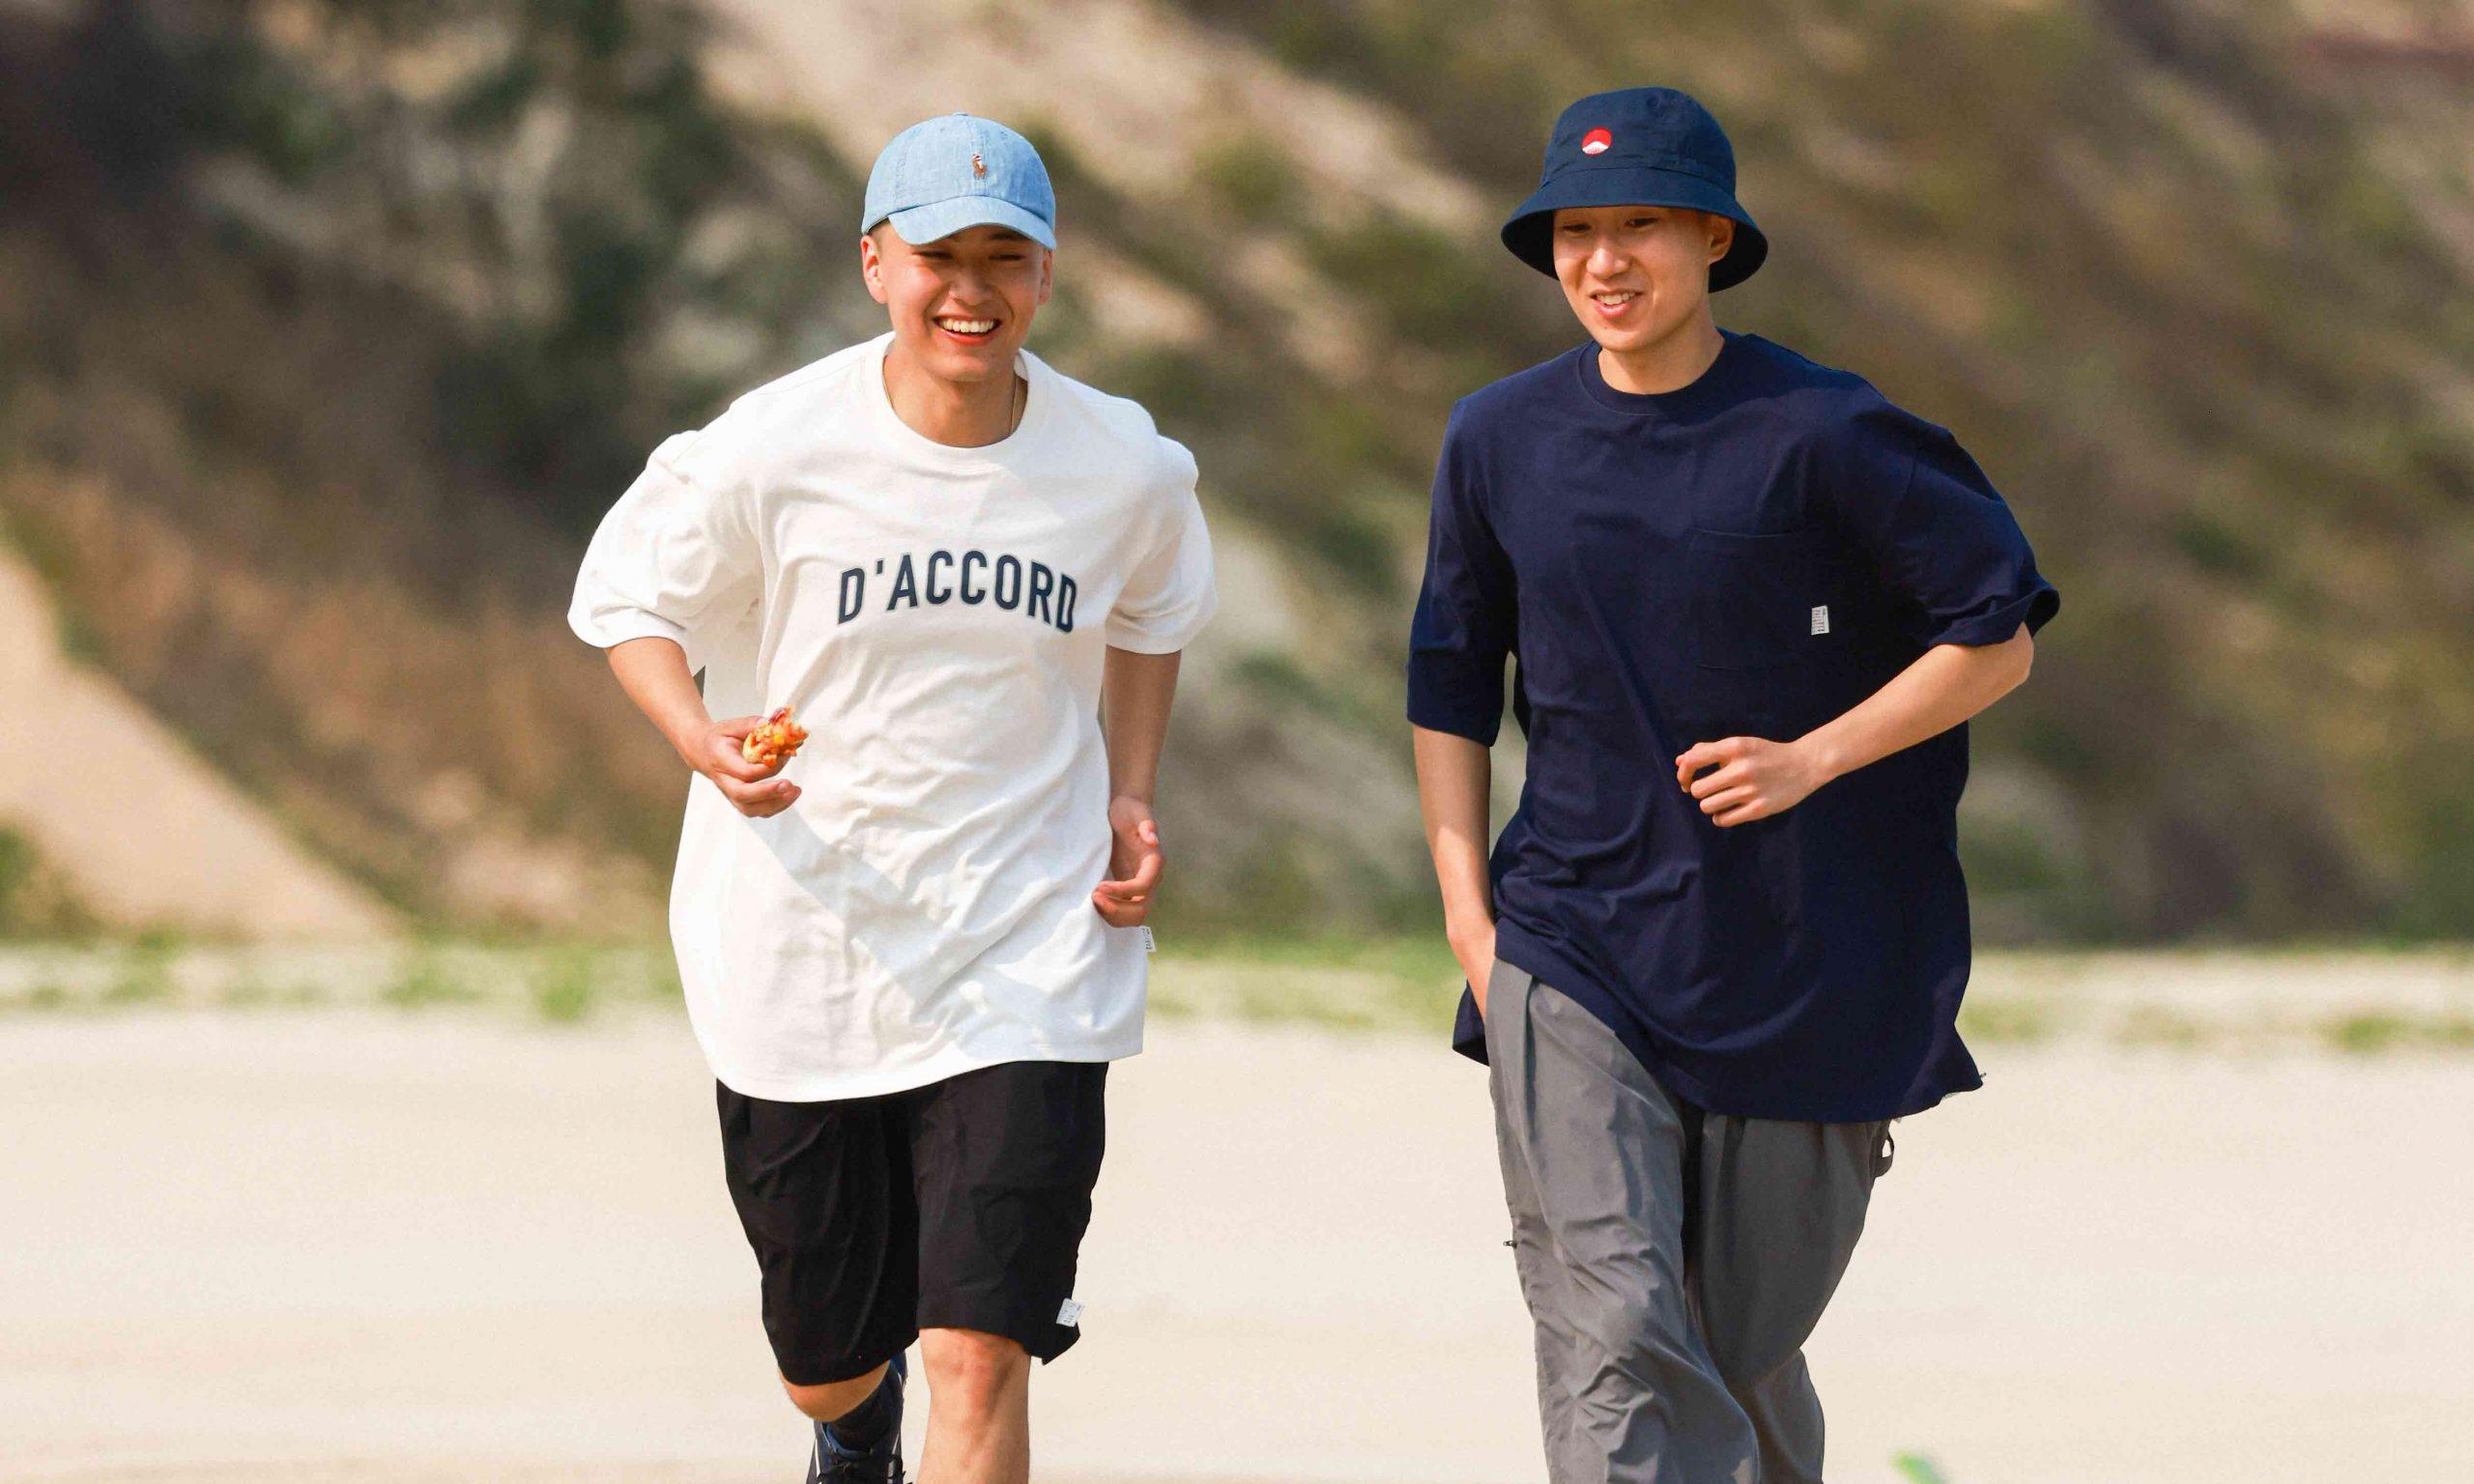 PIN SKTBS 2021 春夏「Beach Boys」系列造型特辑释出